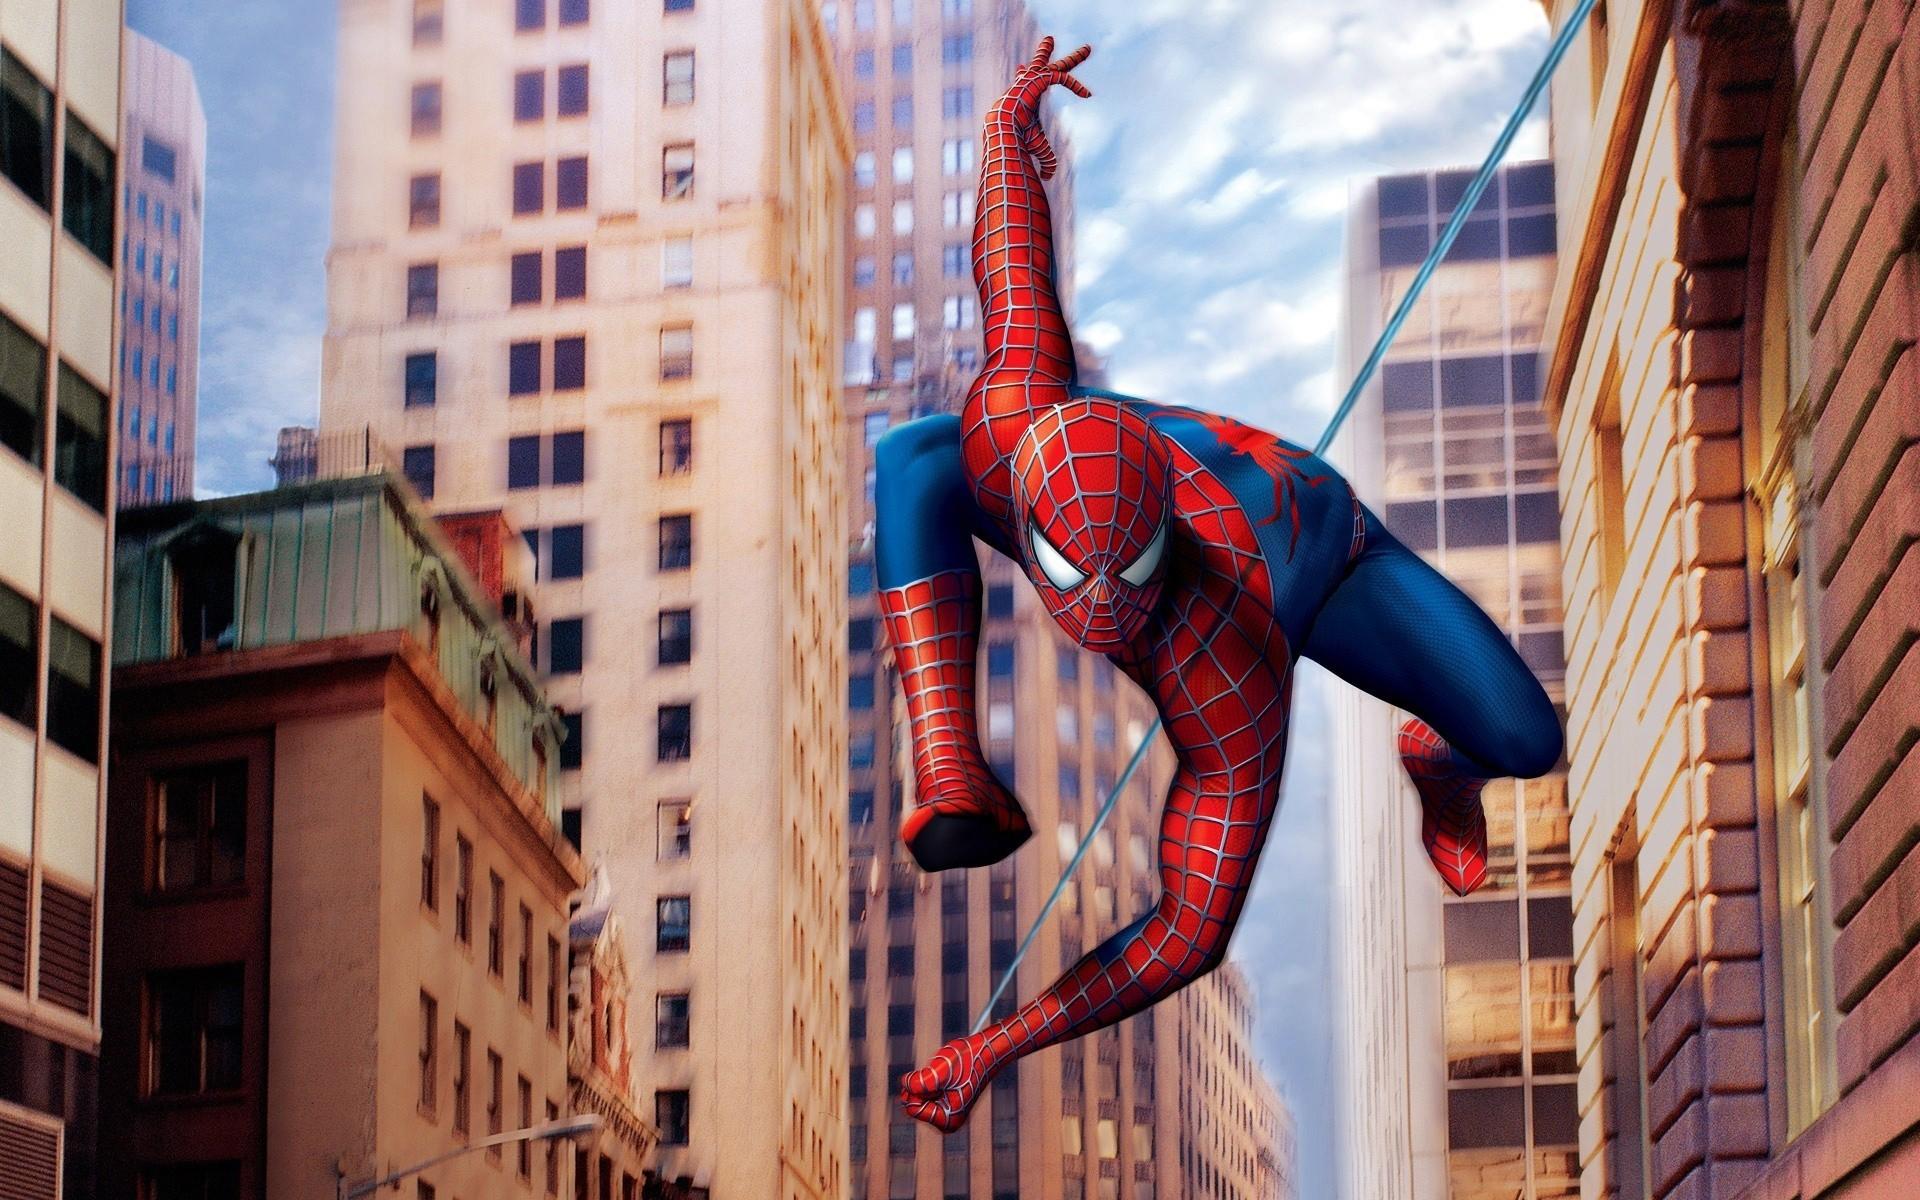 Человек-паук картинка большая